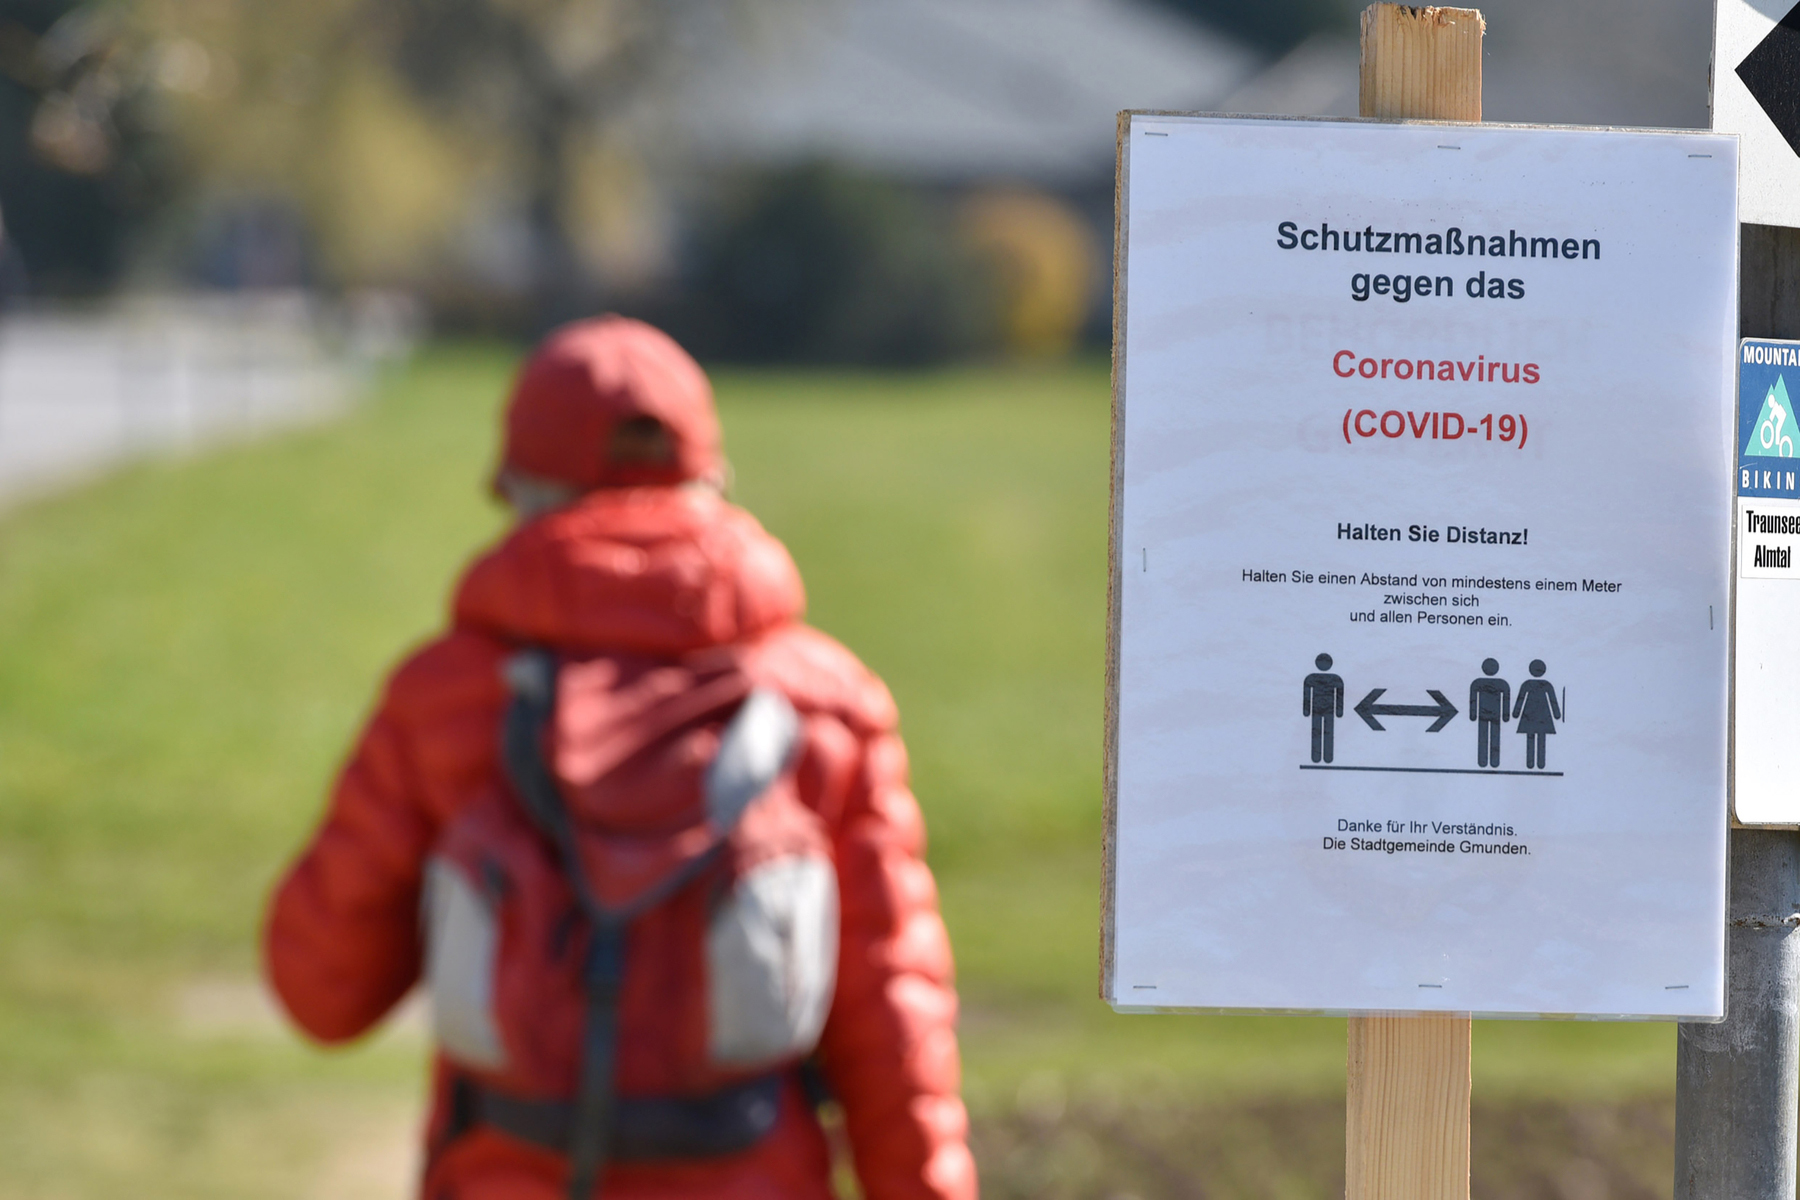 Coronavirus warning sign in Austria